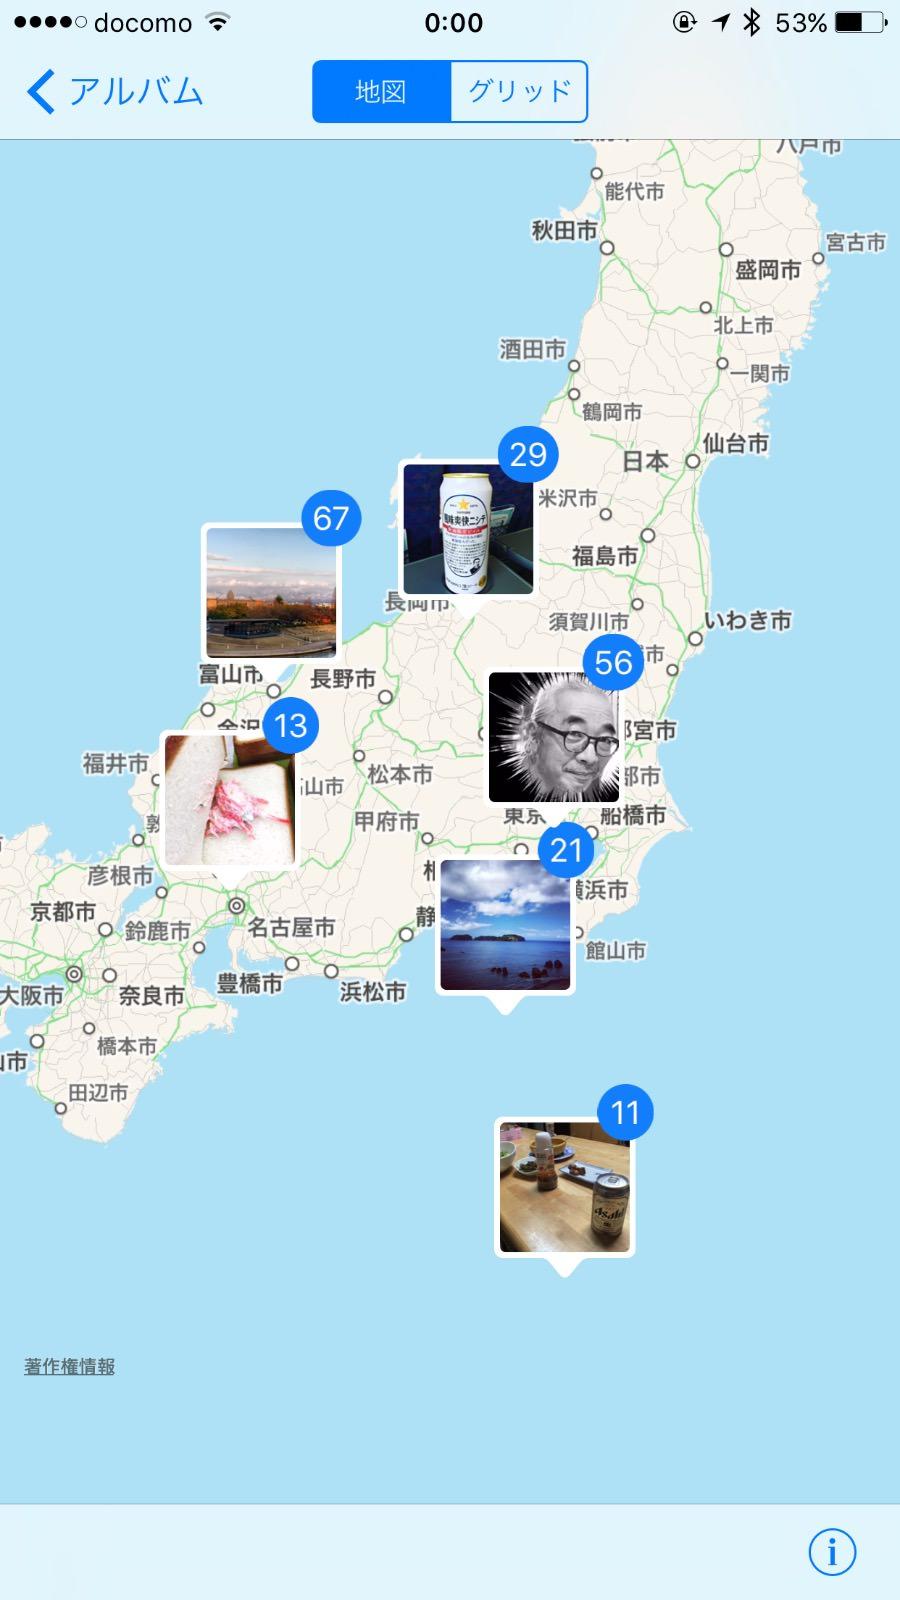 【iOS 10】位置情報を利用した「撮影地」アルバムが便利